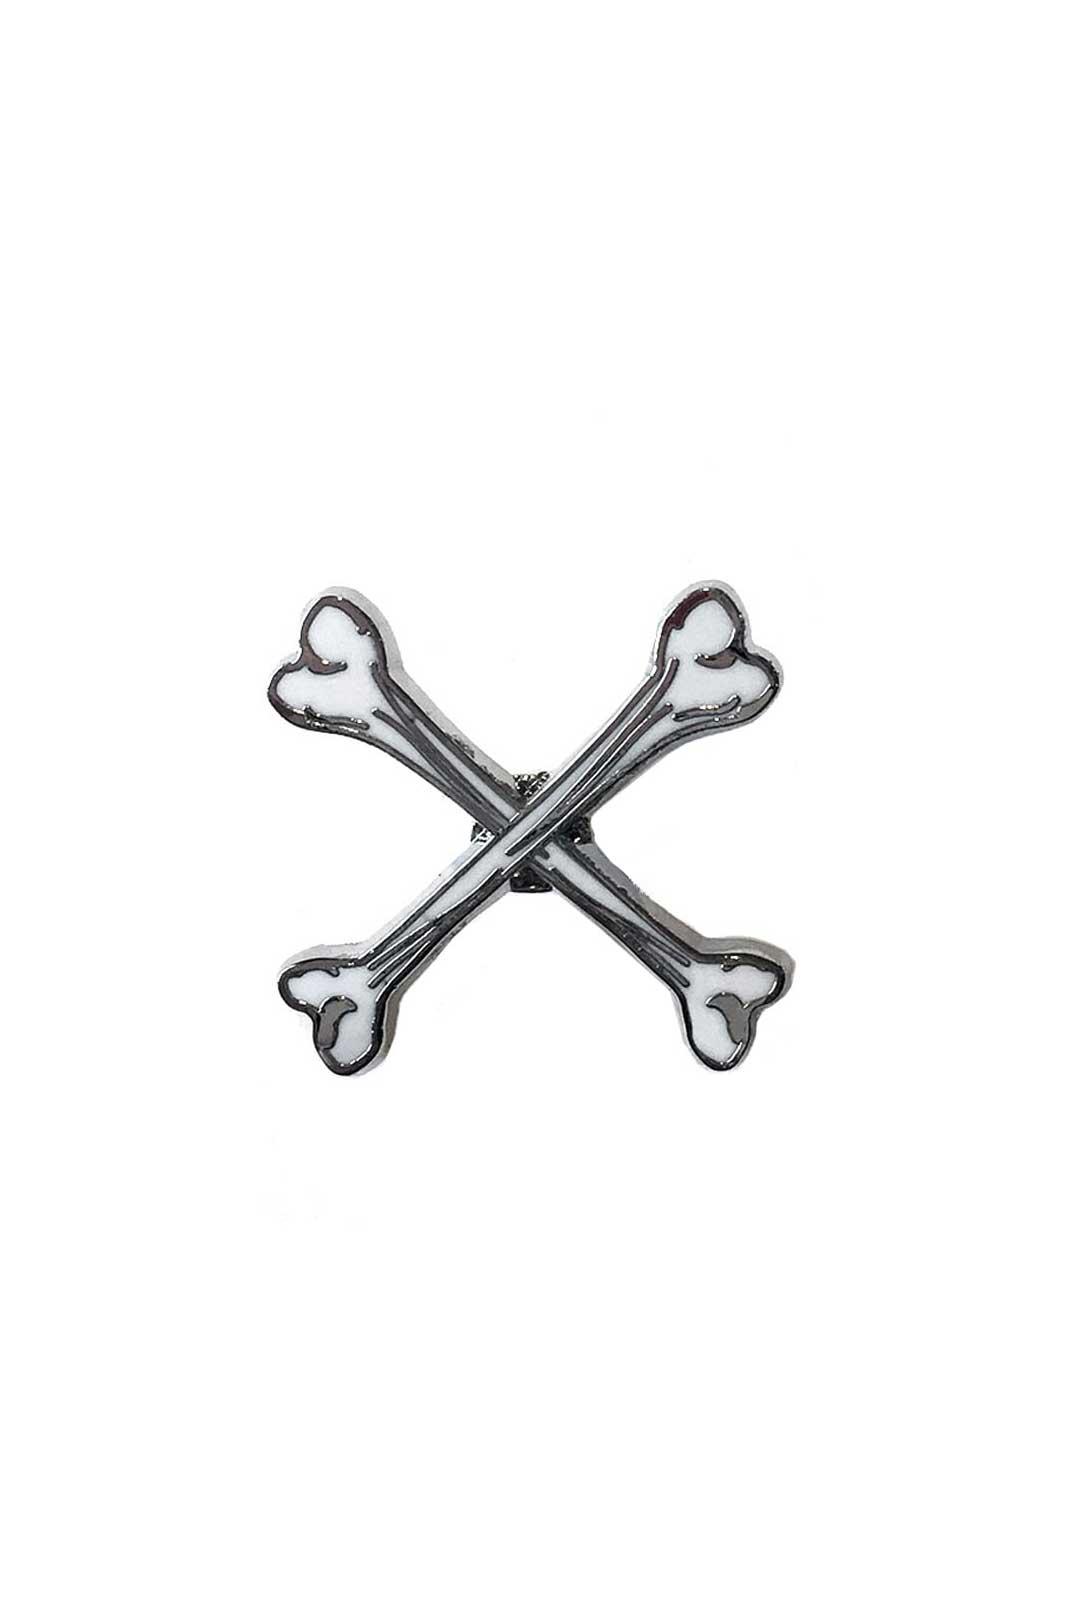 X Marks The Spot Enamel Pin